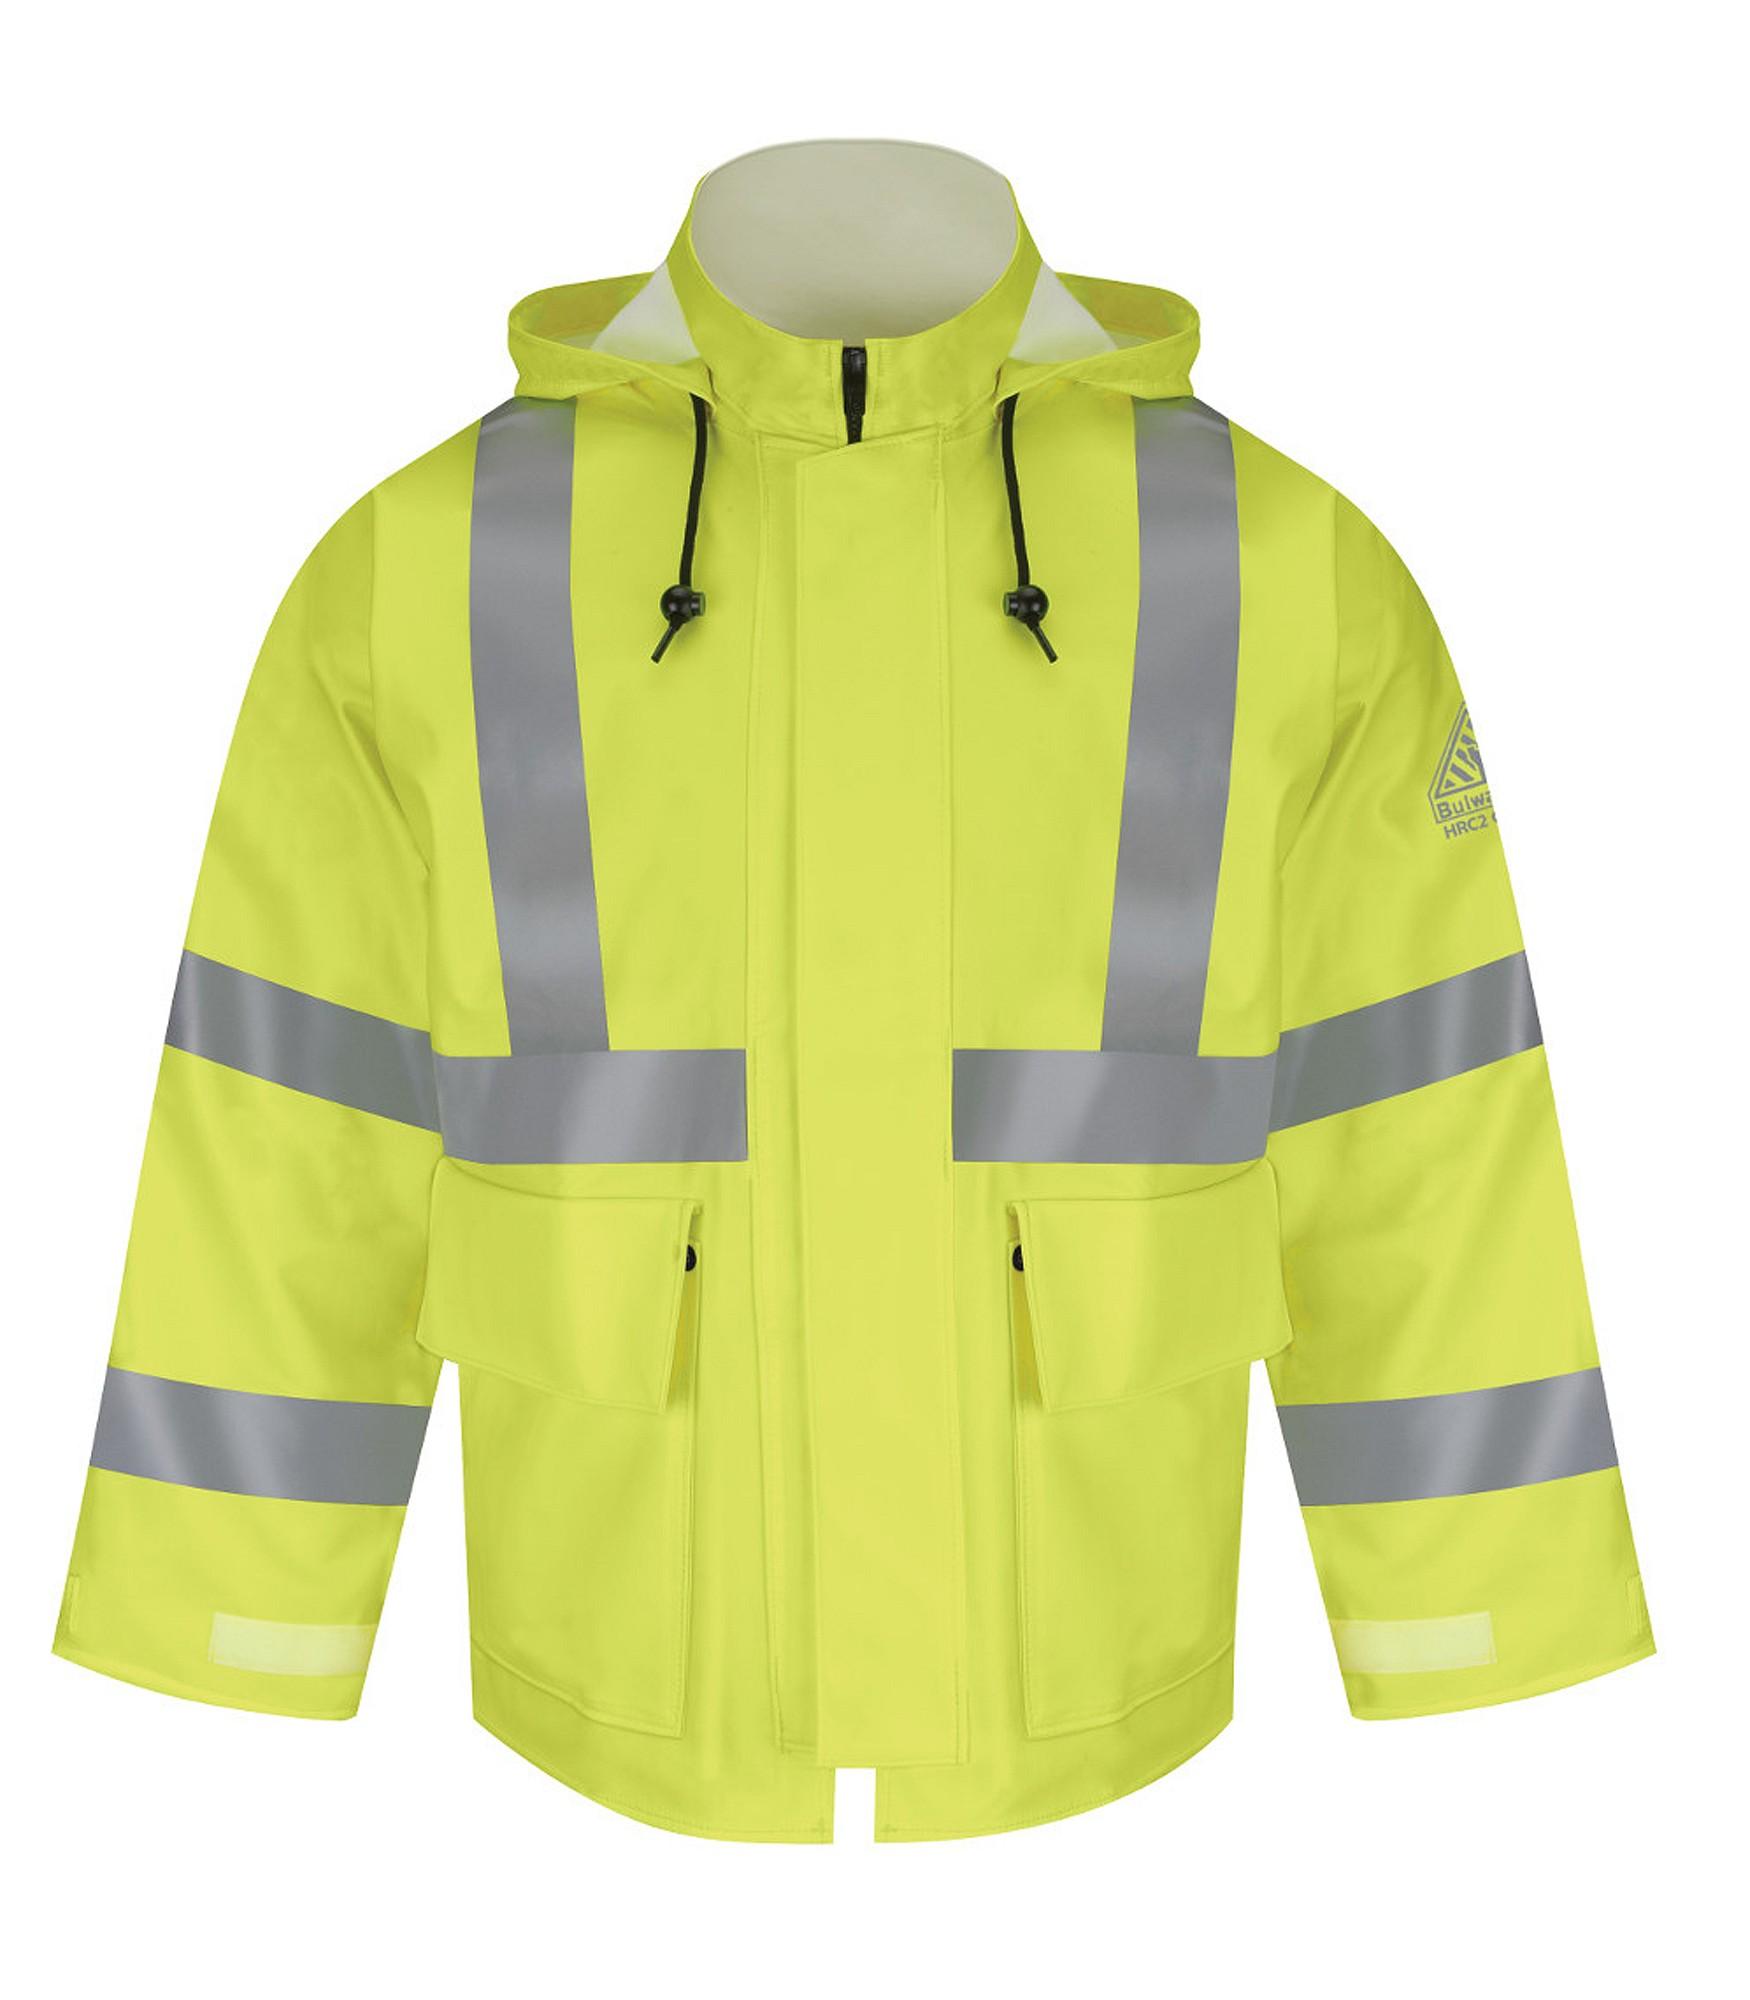 Take-up Tabs on Cuff Yellow//Green Bulwark Flame Resistant 10 oz Hi-Visibility Regular Rain Jacket HRC2